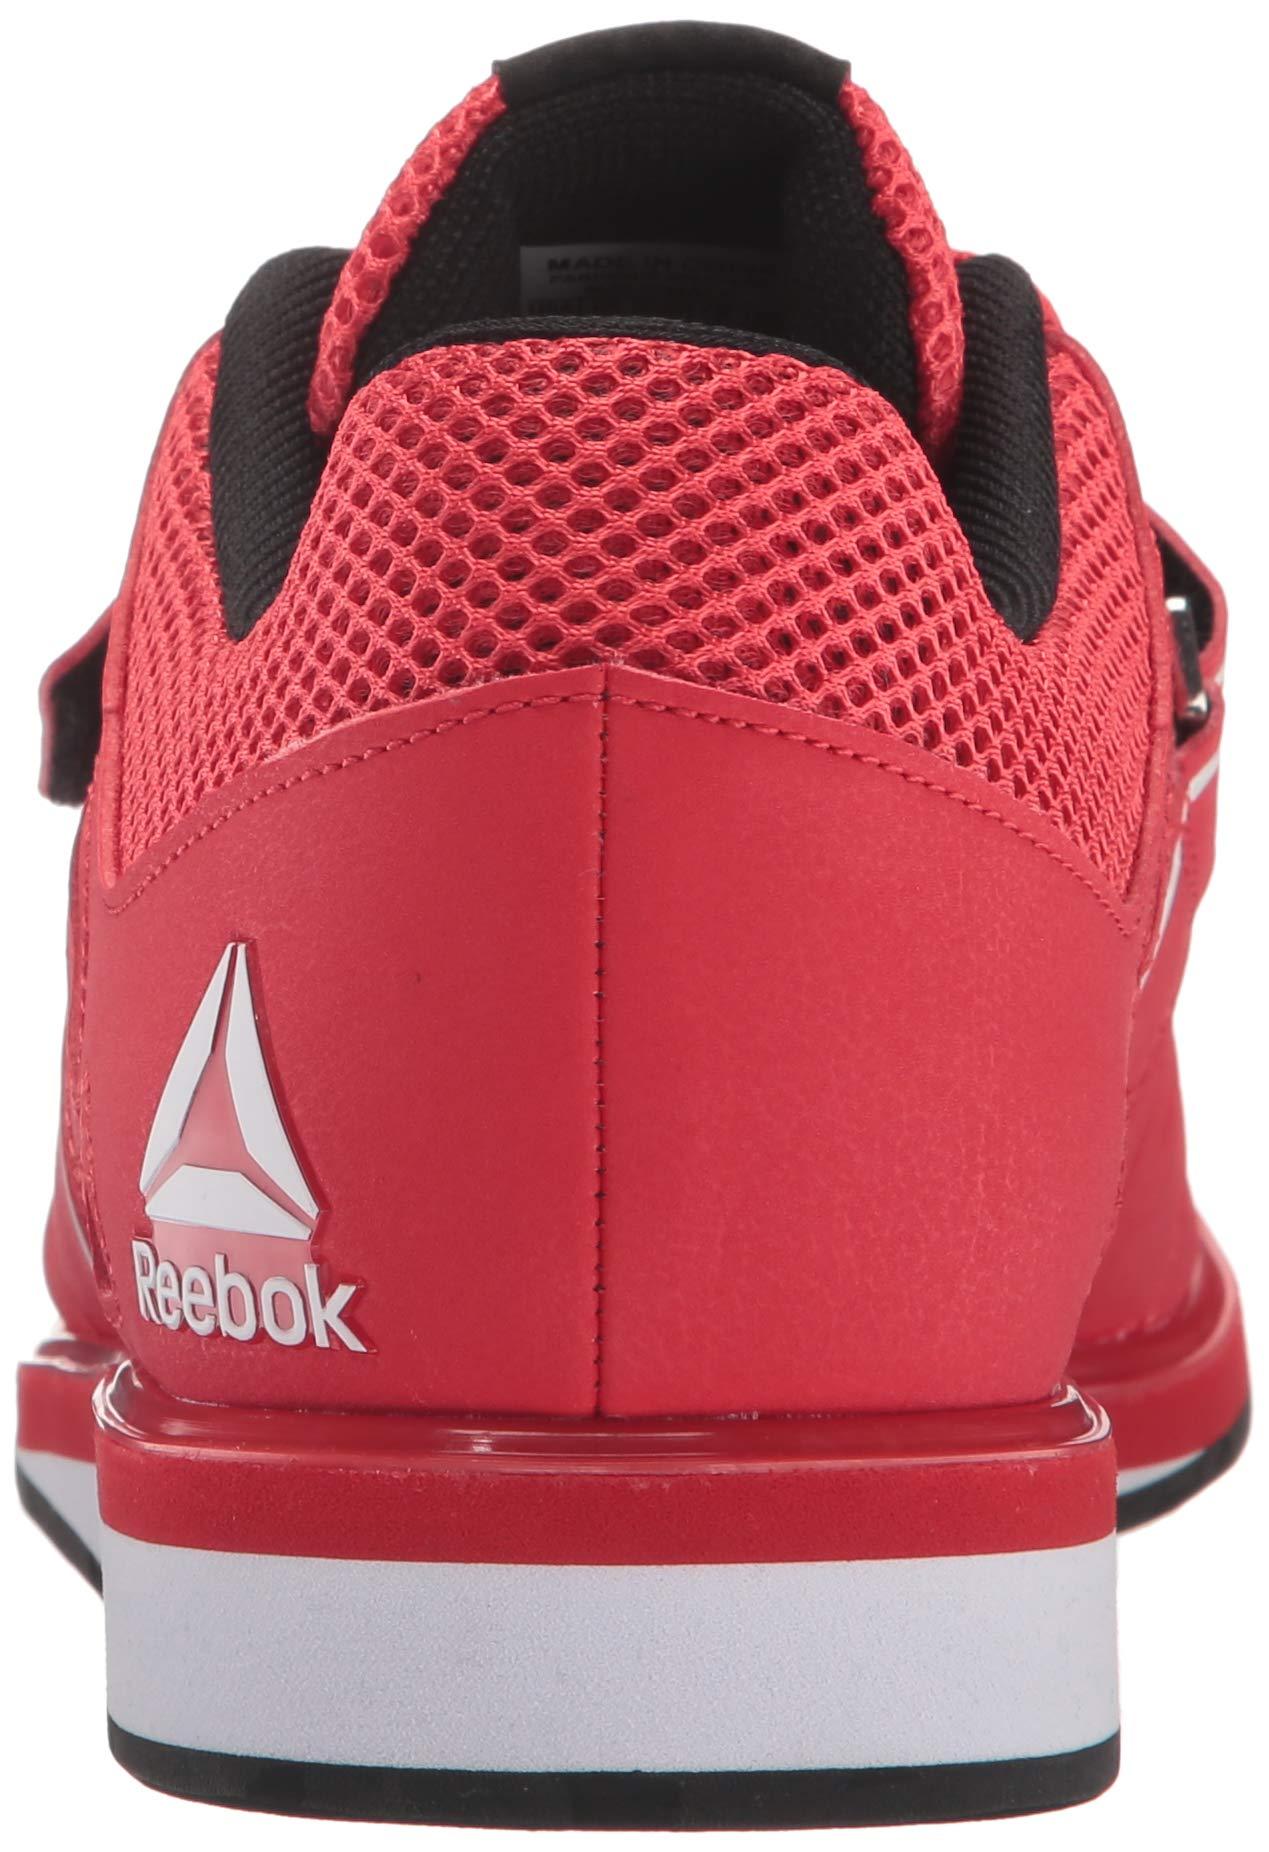 Reebok Men's Lifter Pr Cross-Trainer Shoe, Primal Red/Black/White, 7.5 M US by Reebok (Image #2)